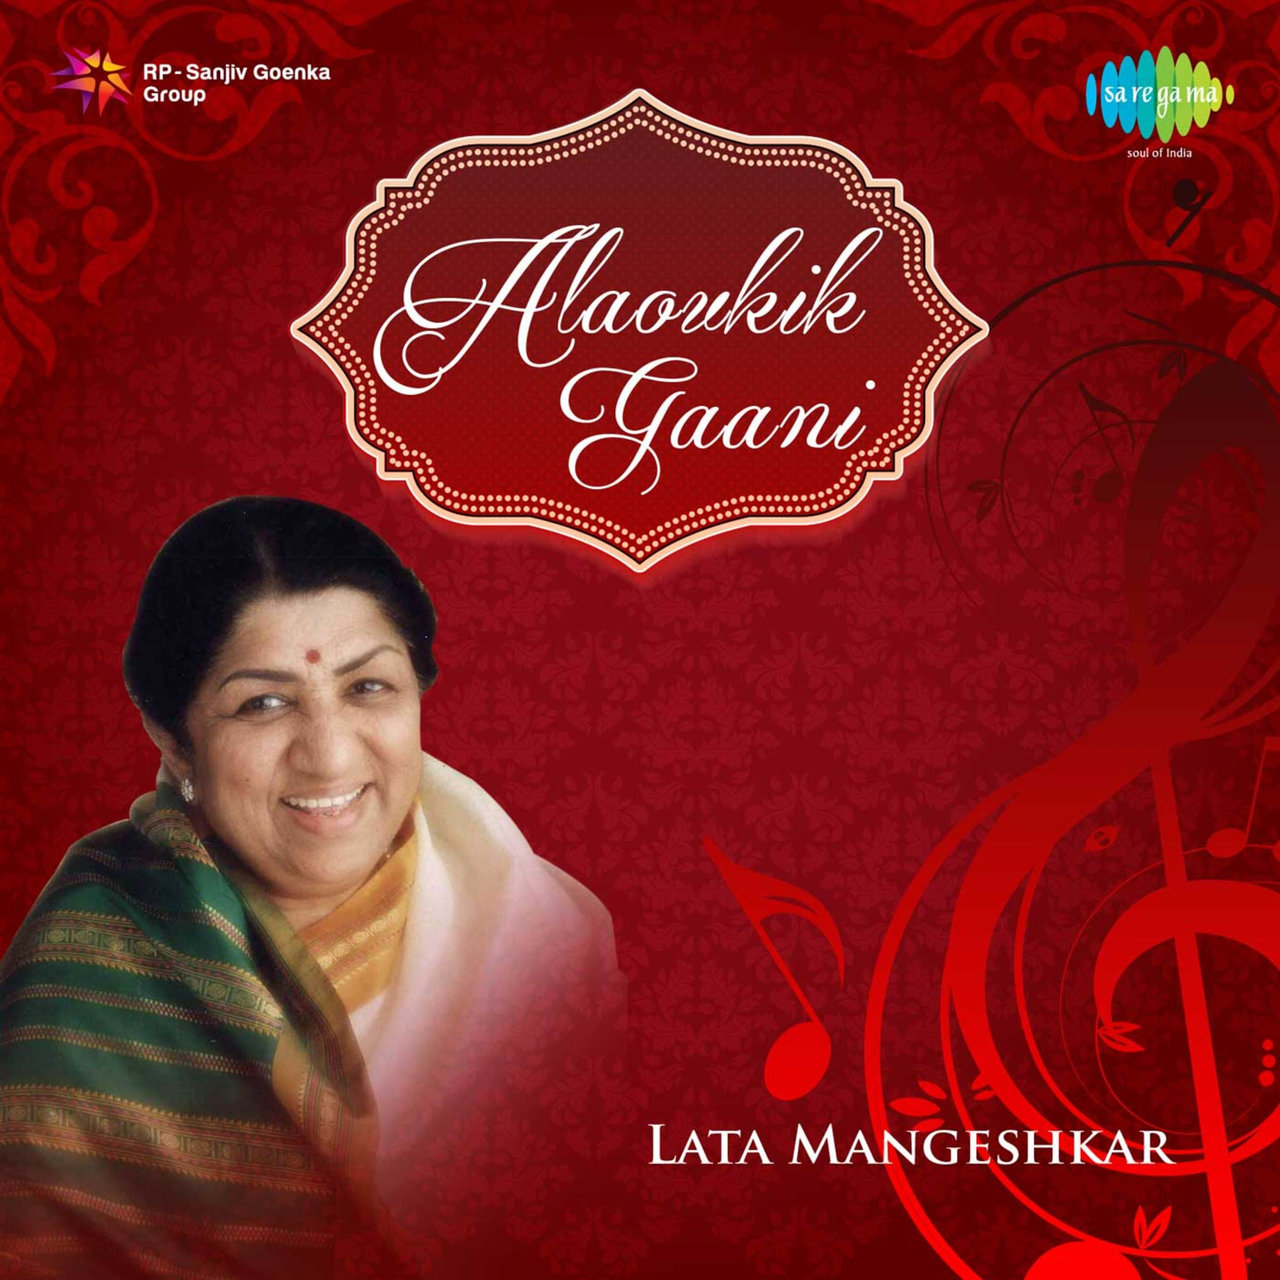 Naino Ki Jo Baat Dj Mp3 Song: TIDAL: Listen To Lata Mangeshkar On TIDAL